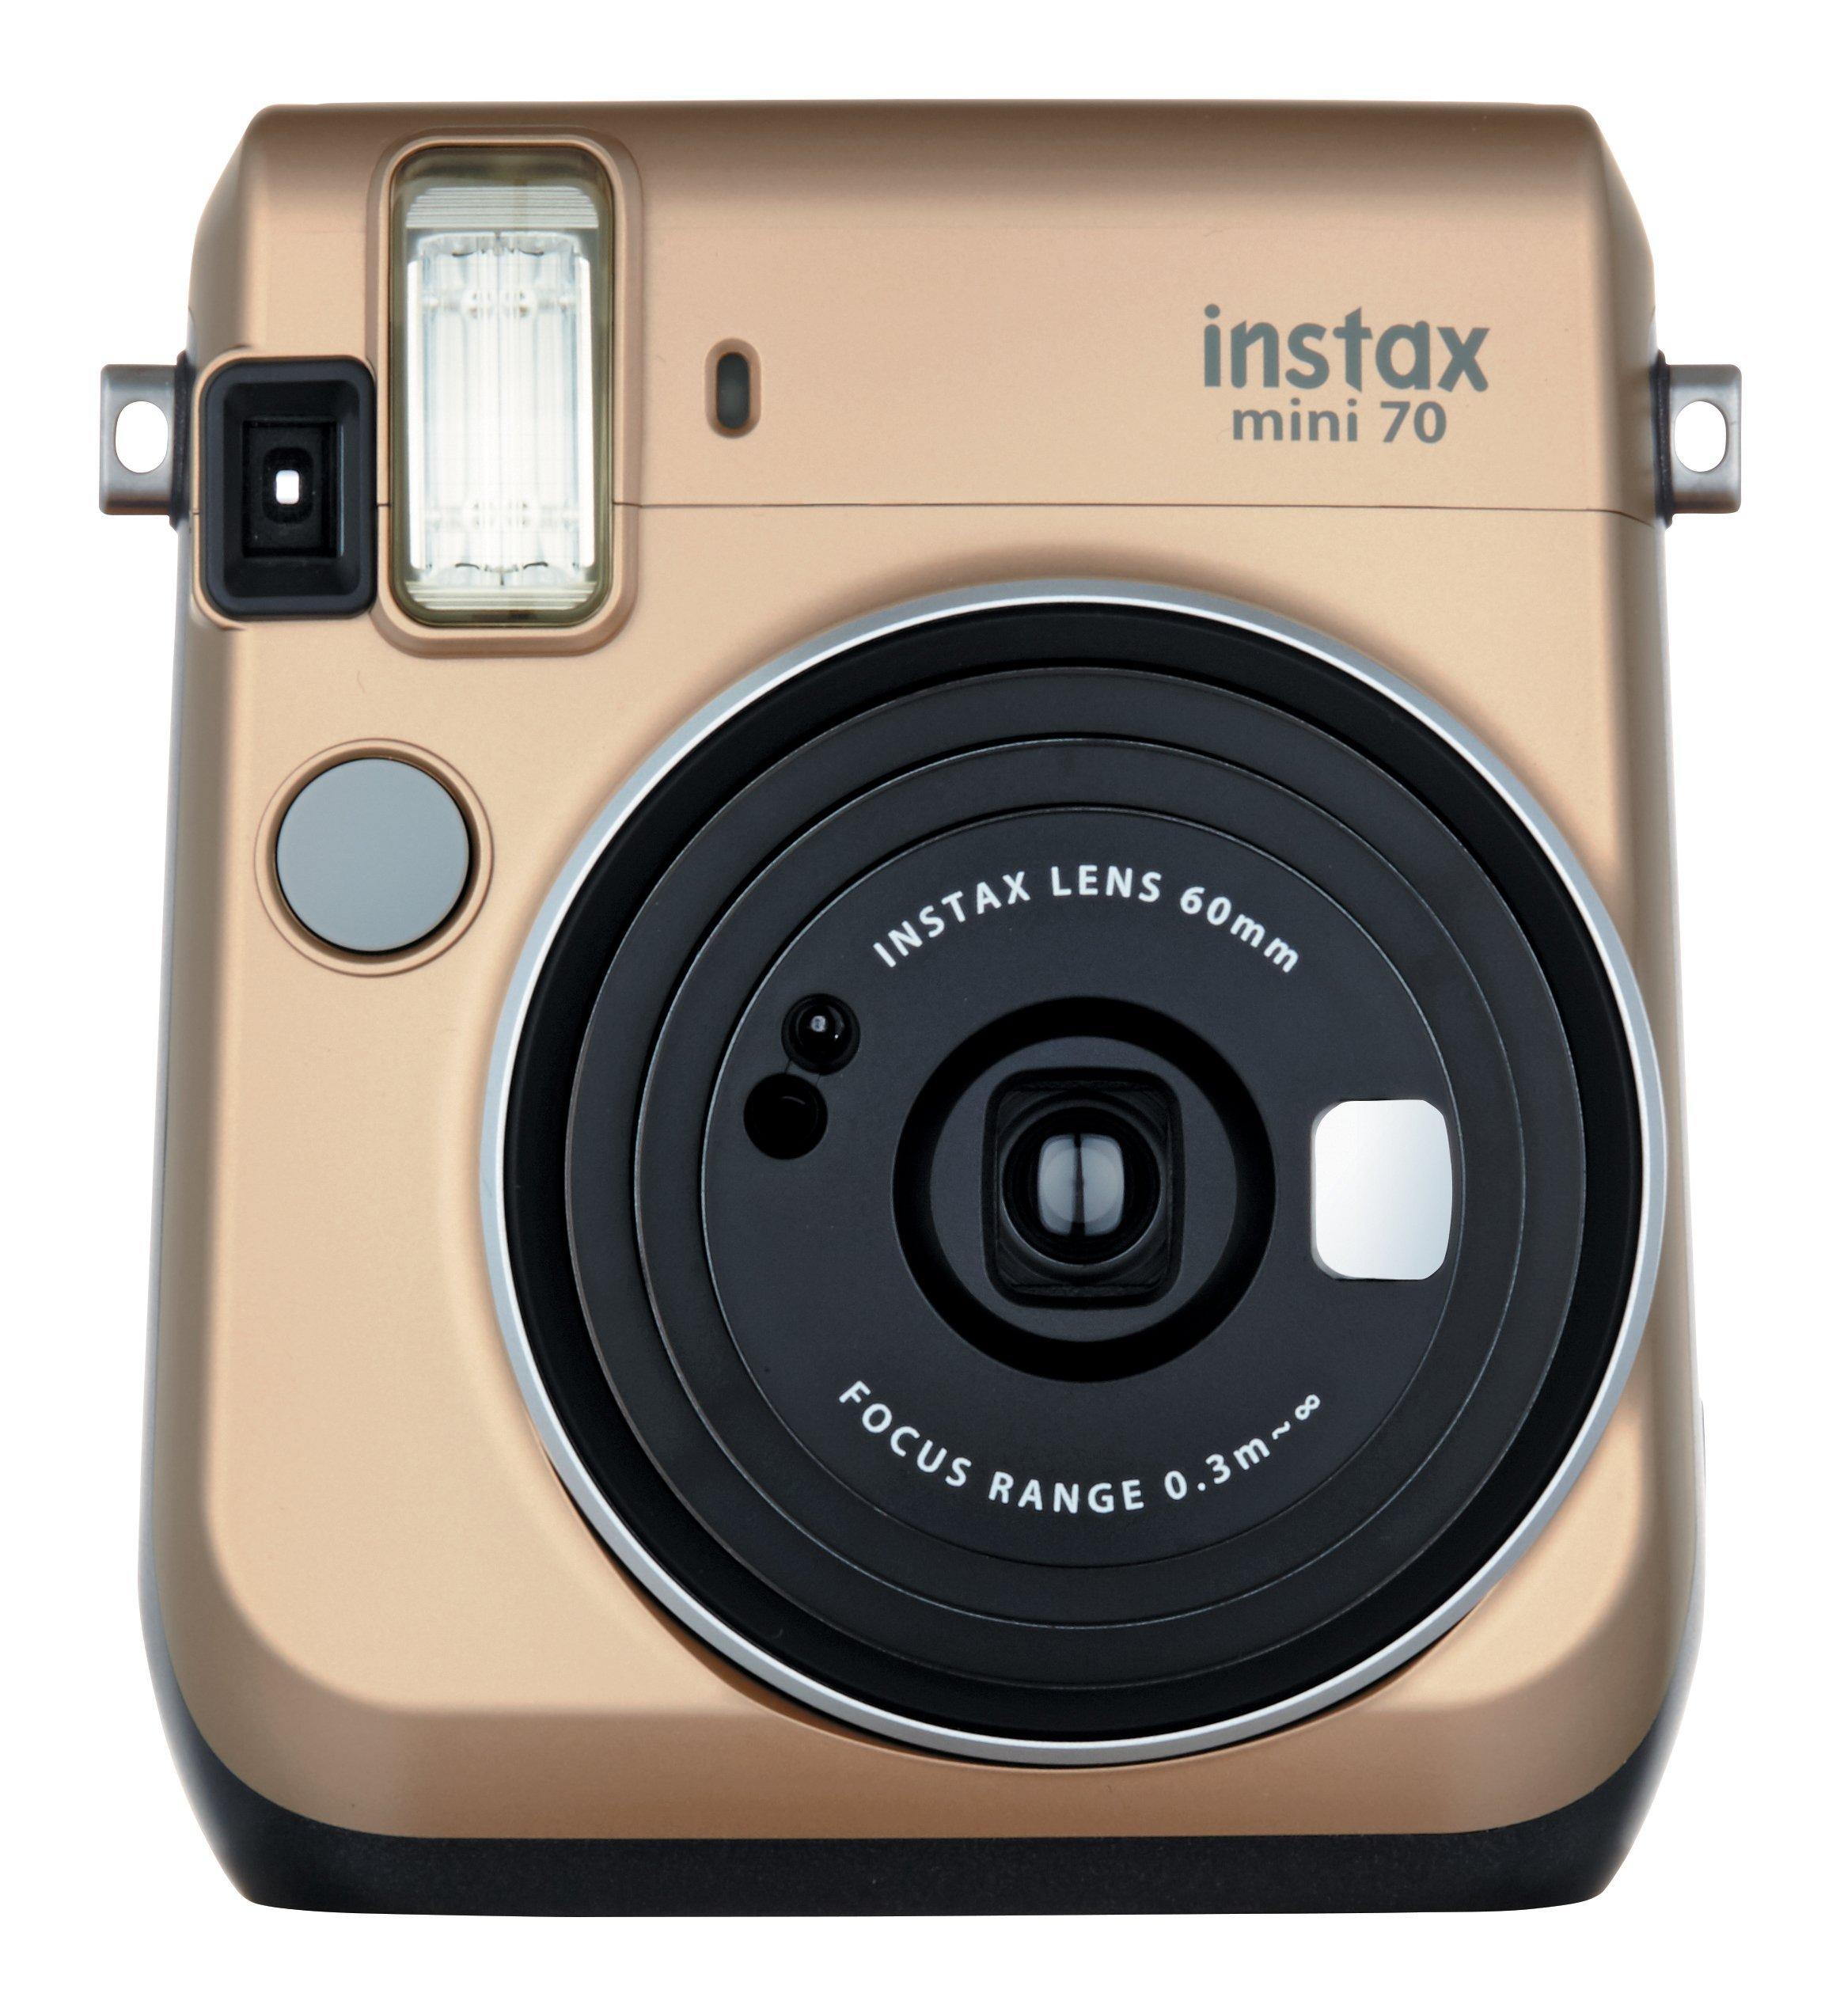 Fujifilm Instax Mini 70 - Instant Film Camera (Gold) by Fujifilm